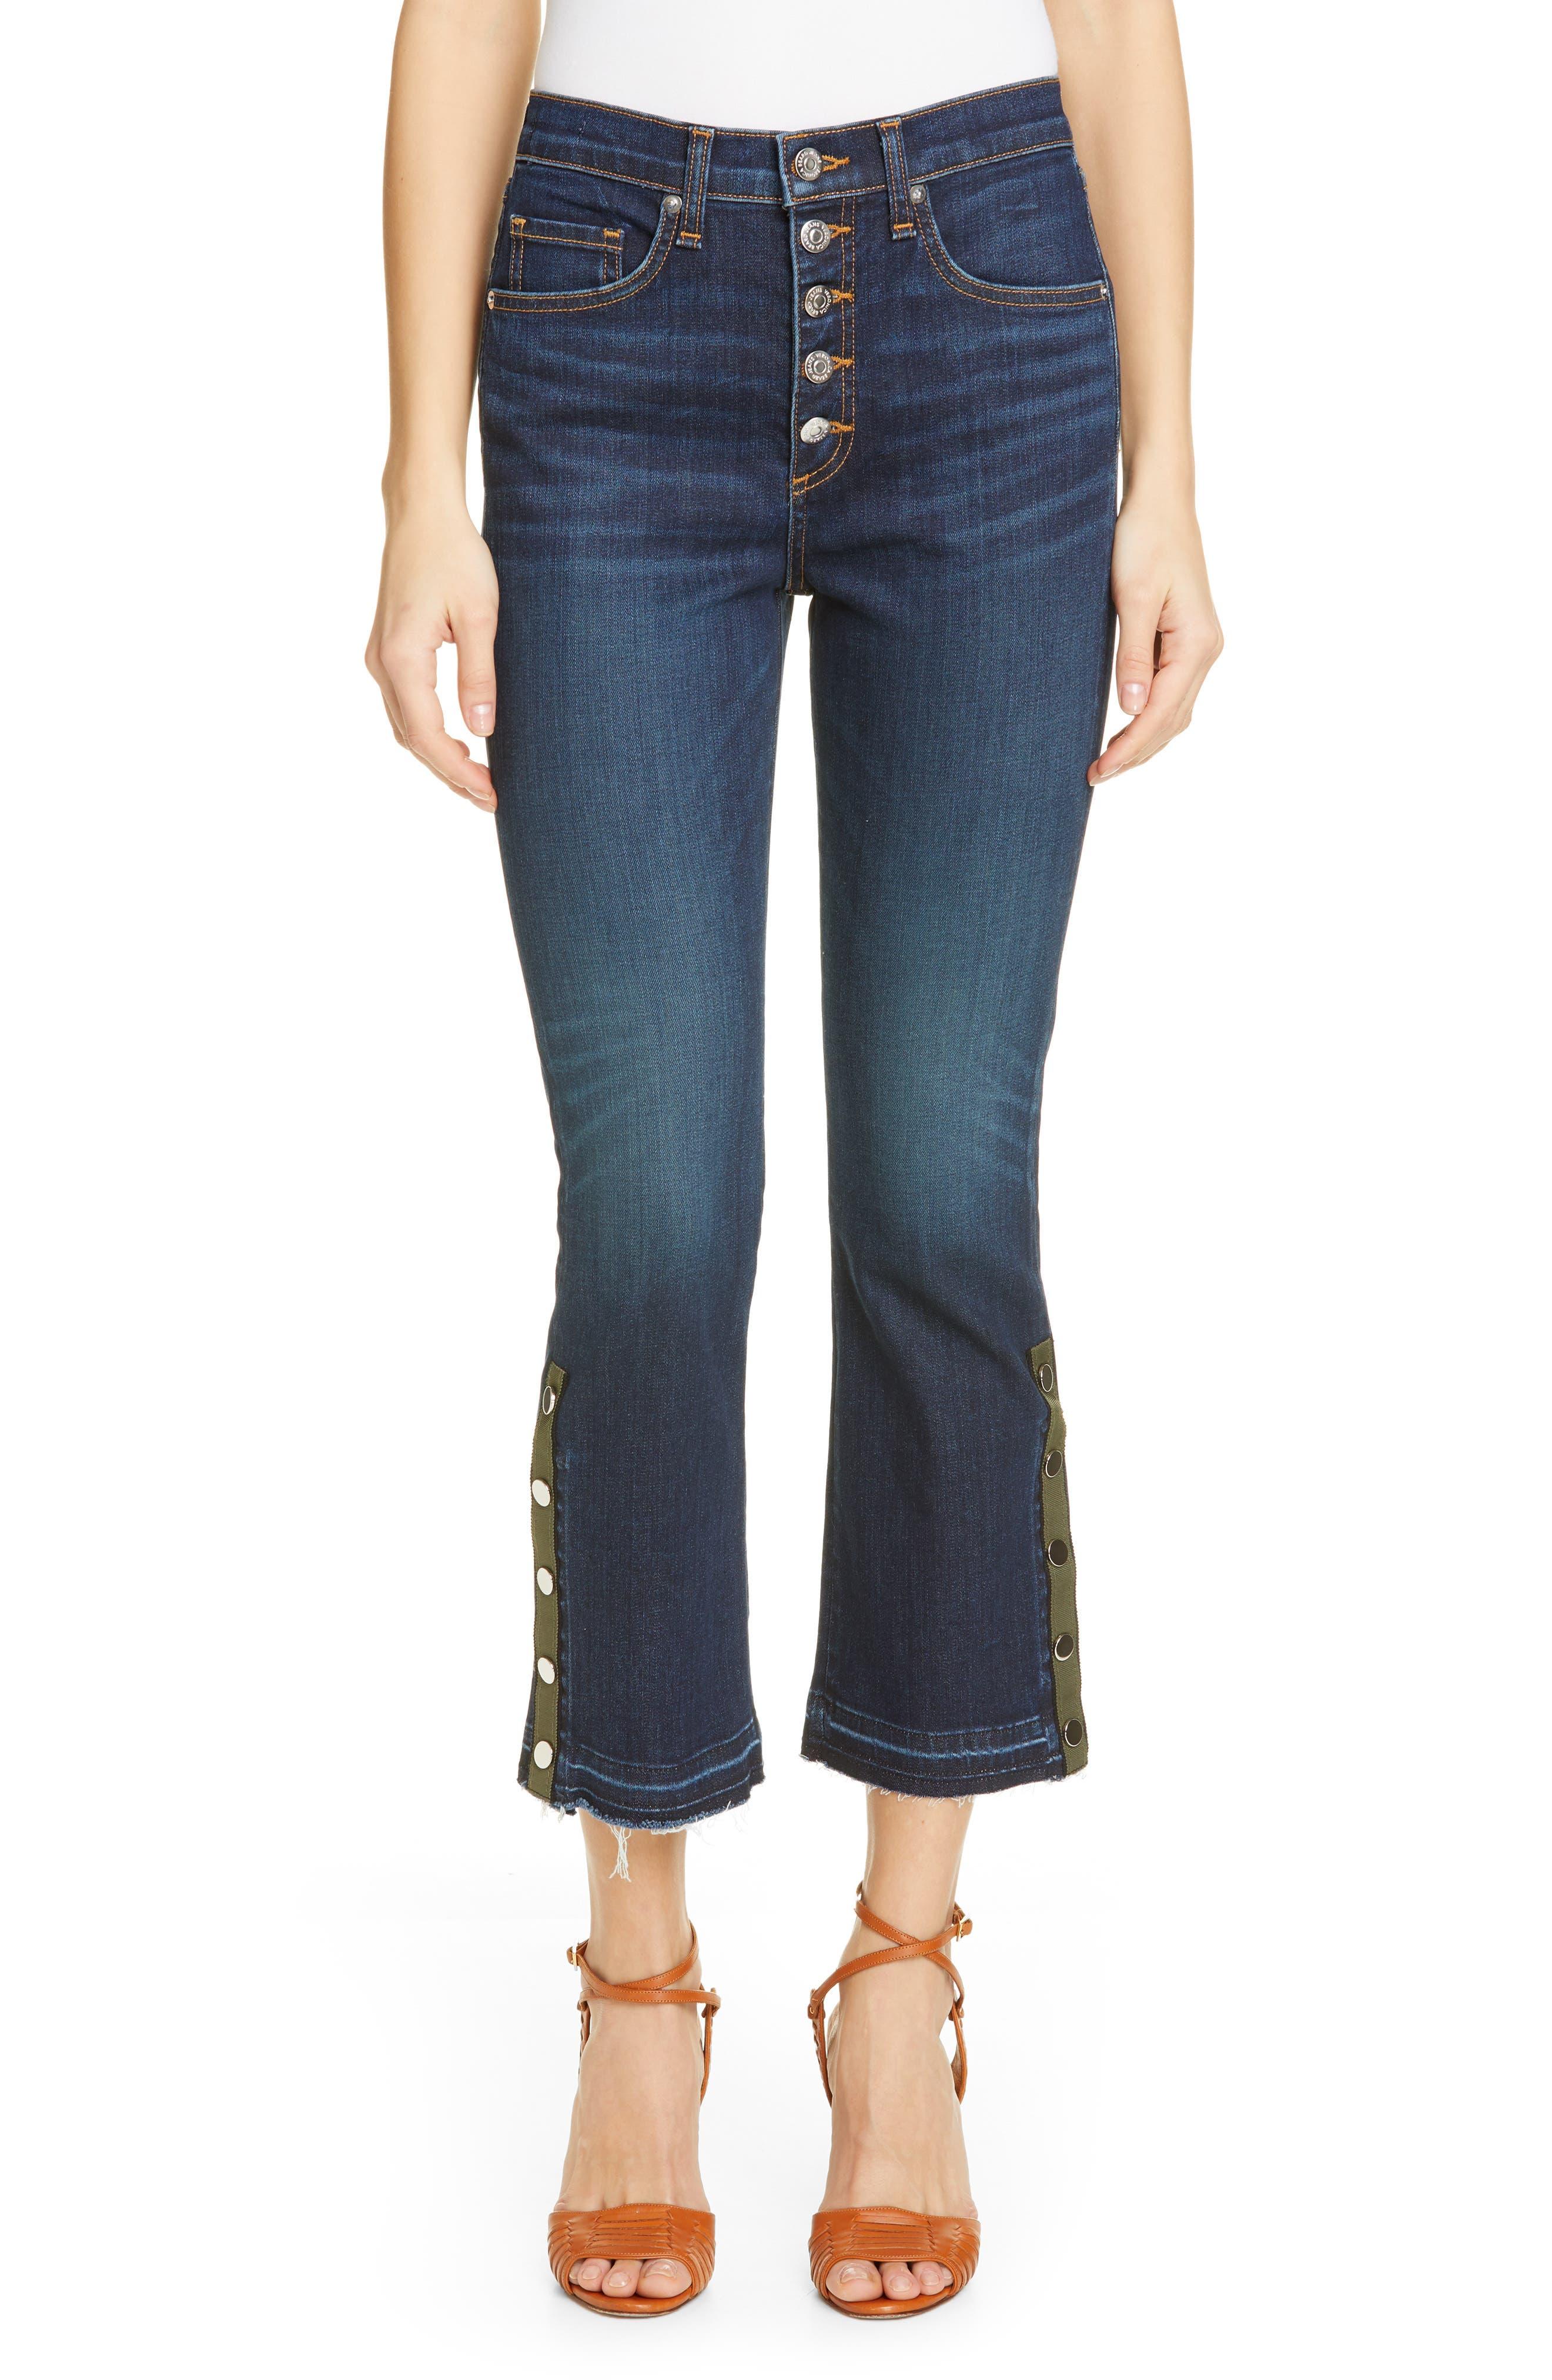 VERONICA BEARD Carolyn Side Vent Baby Boot Jeans, Main, color, DARK VINTAGE